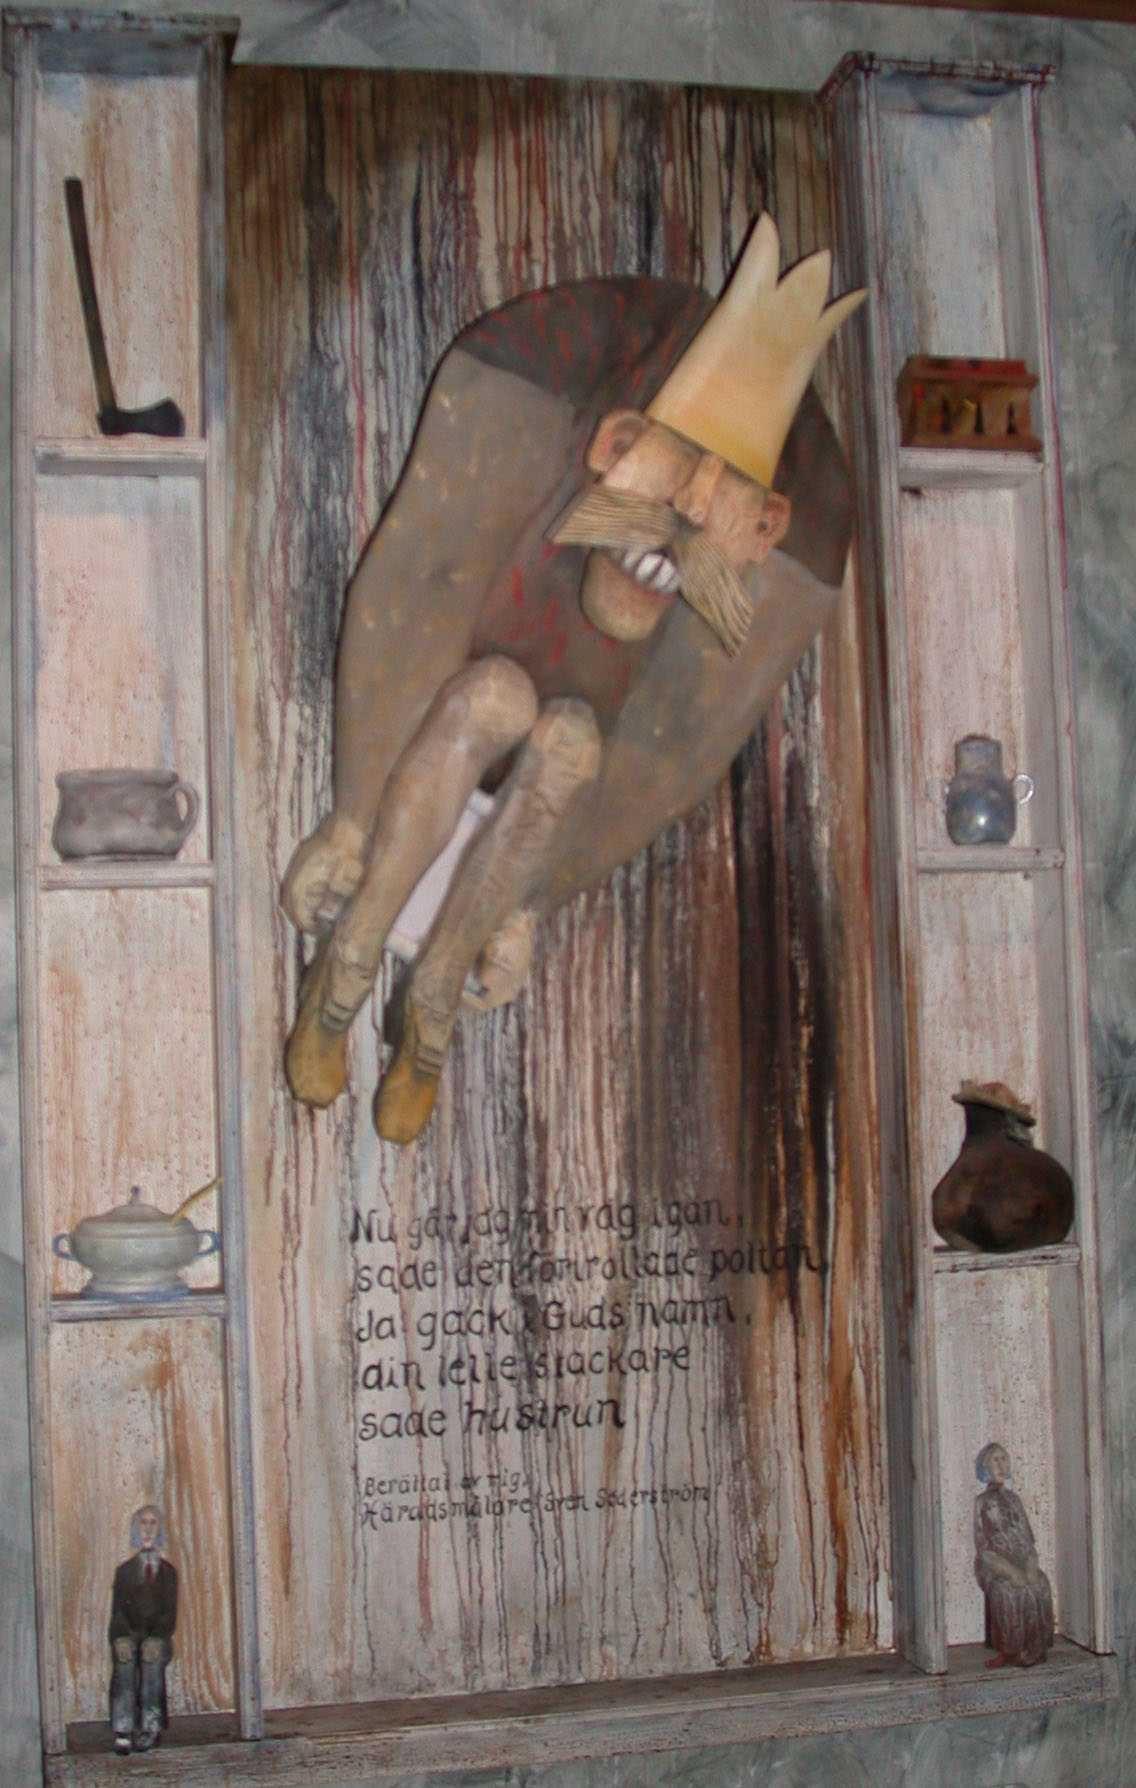 Das Märchenmuseum in Ljungby